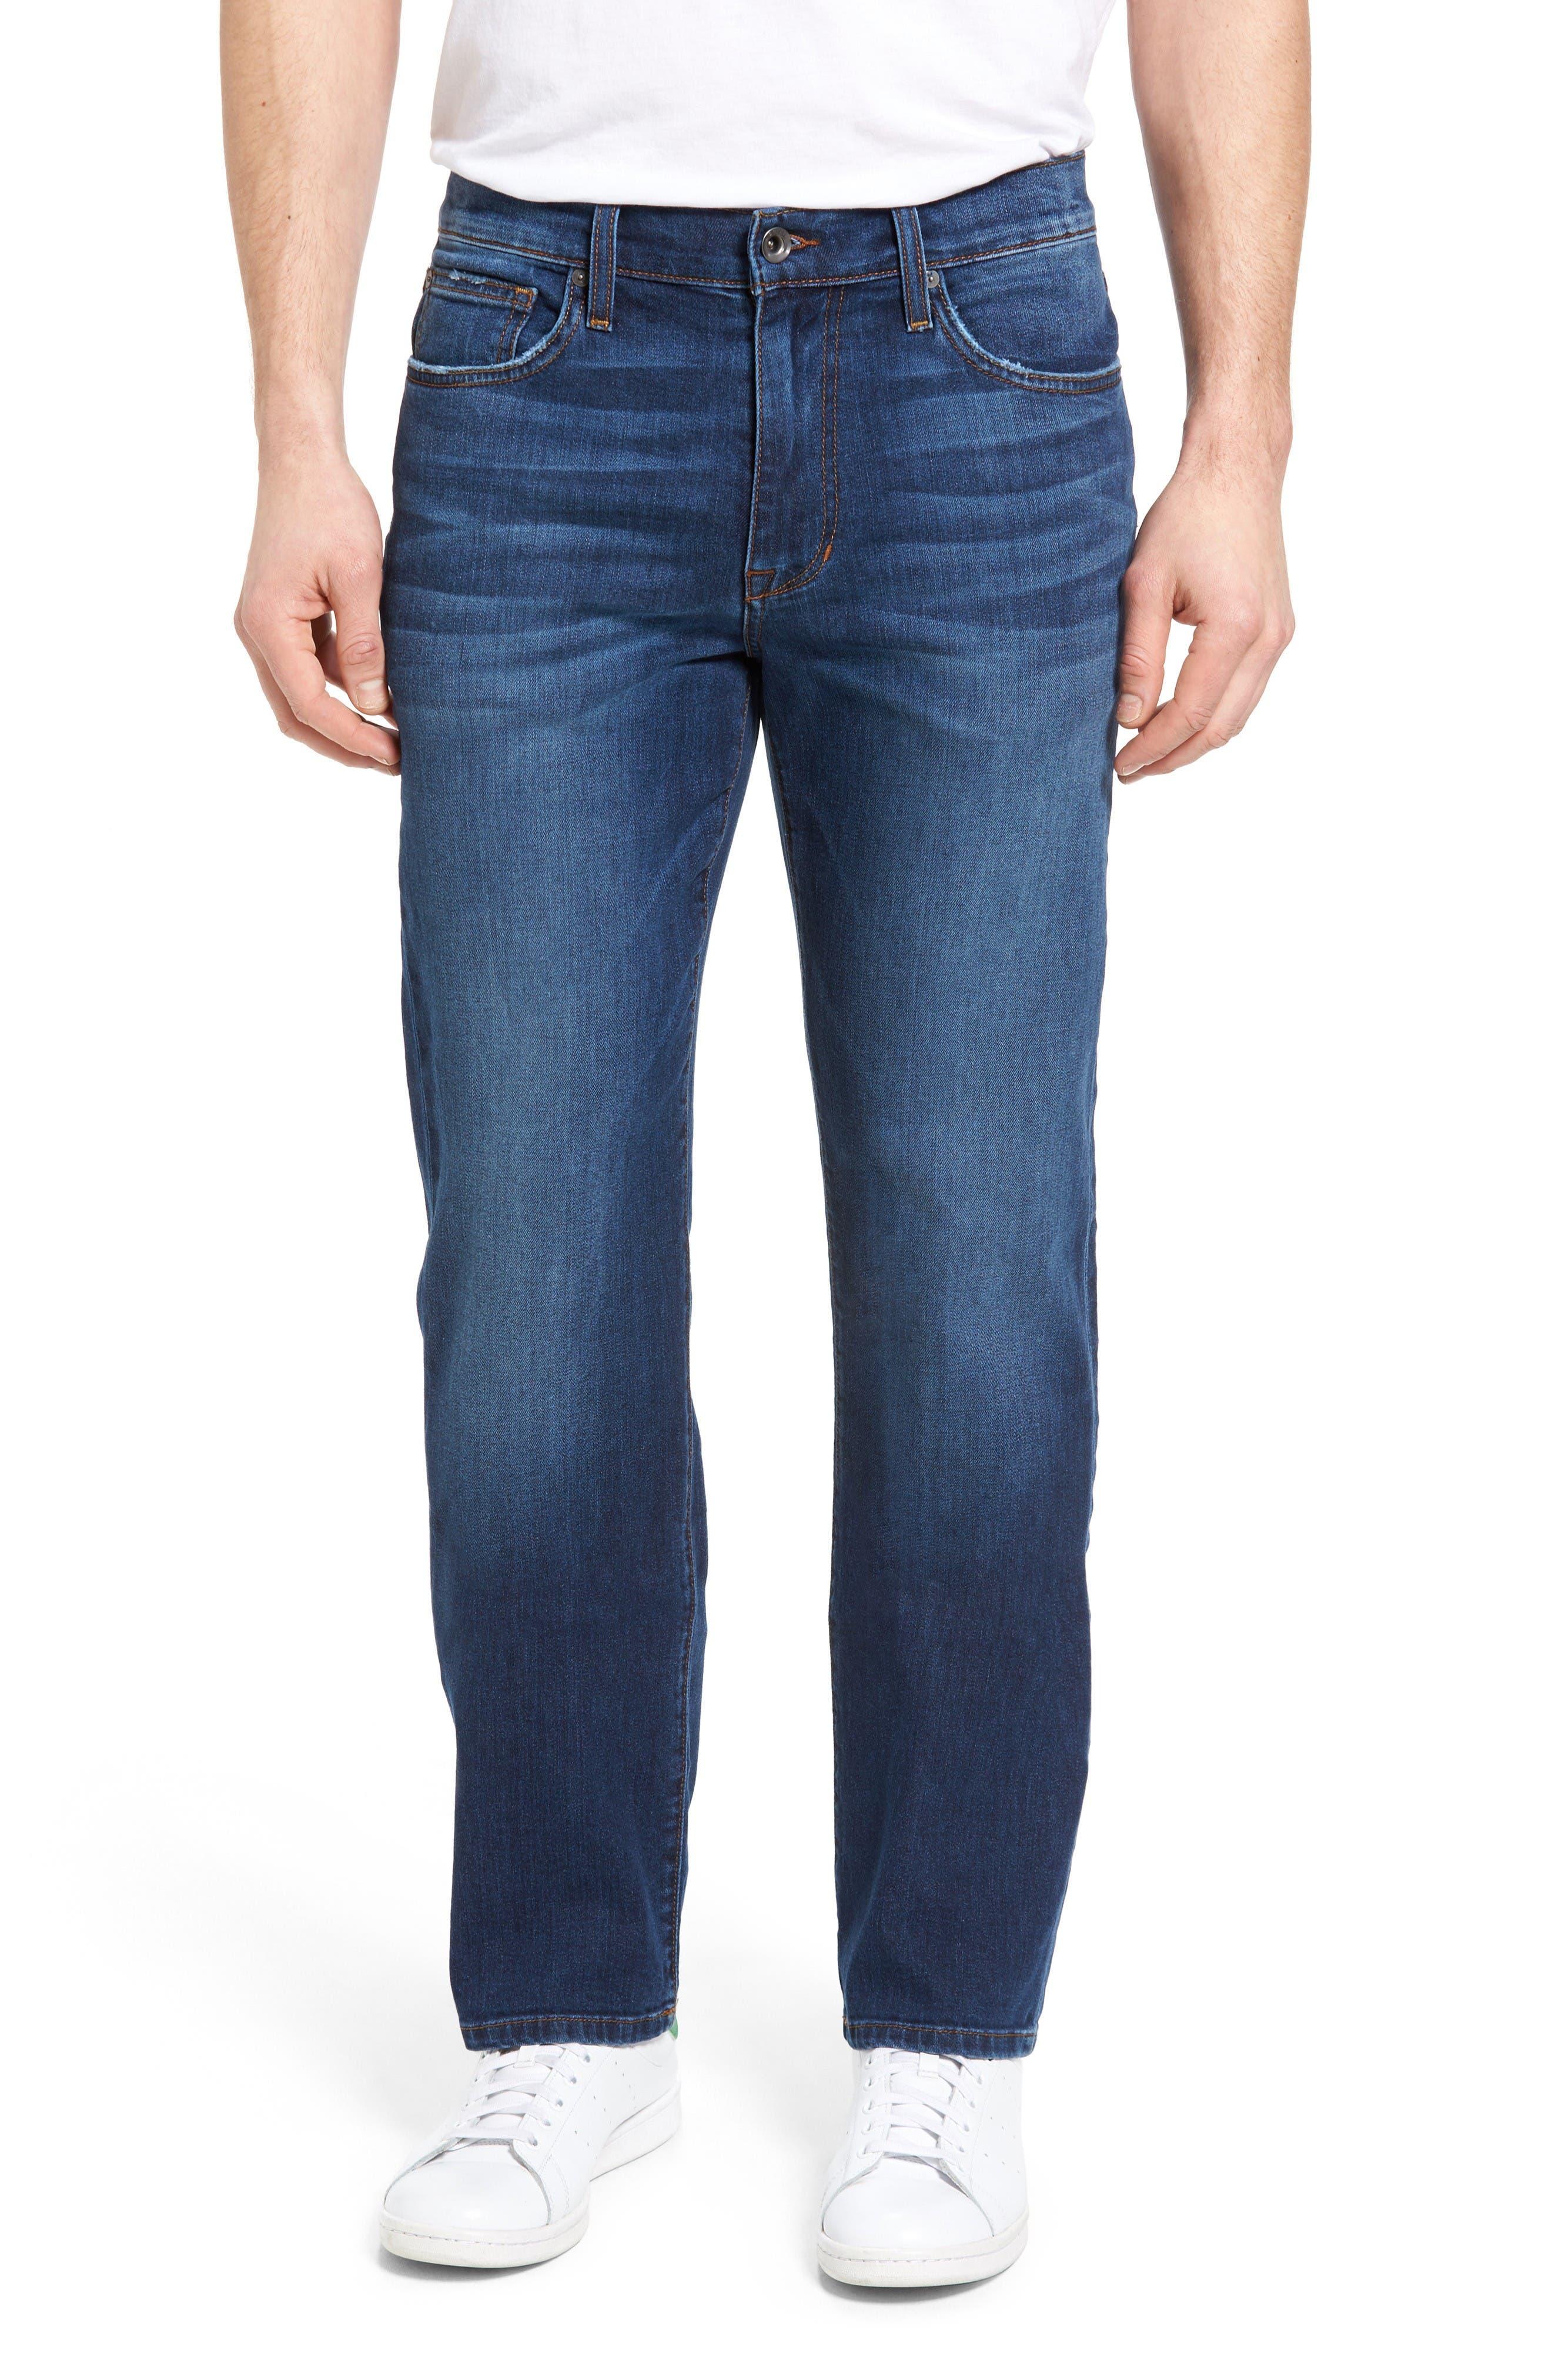 Alternate Image 1 Selected - Joe's Classic Straight Leg Jeans (West)